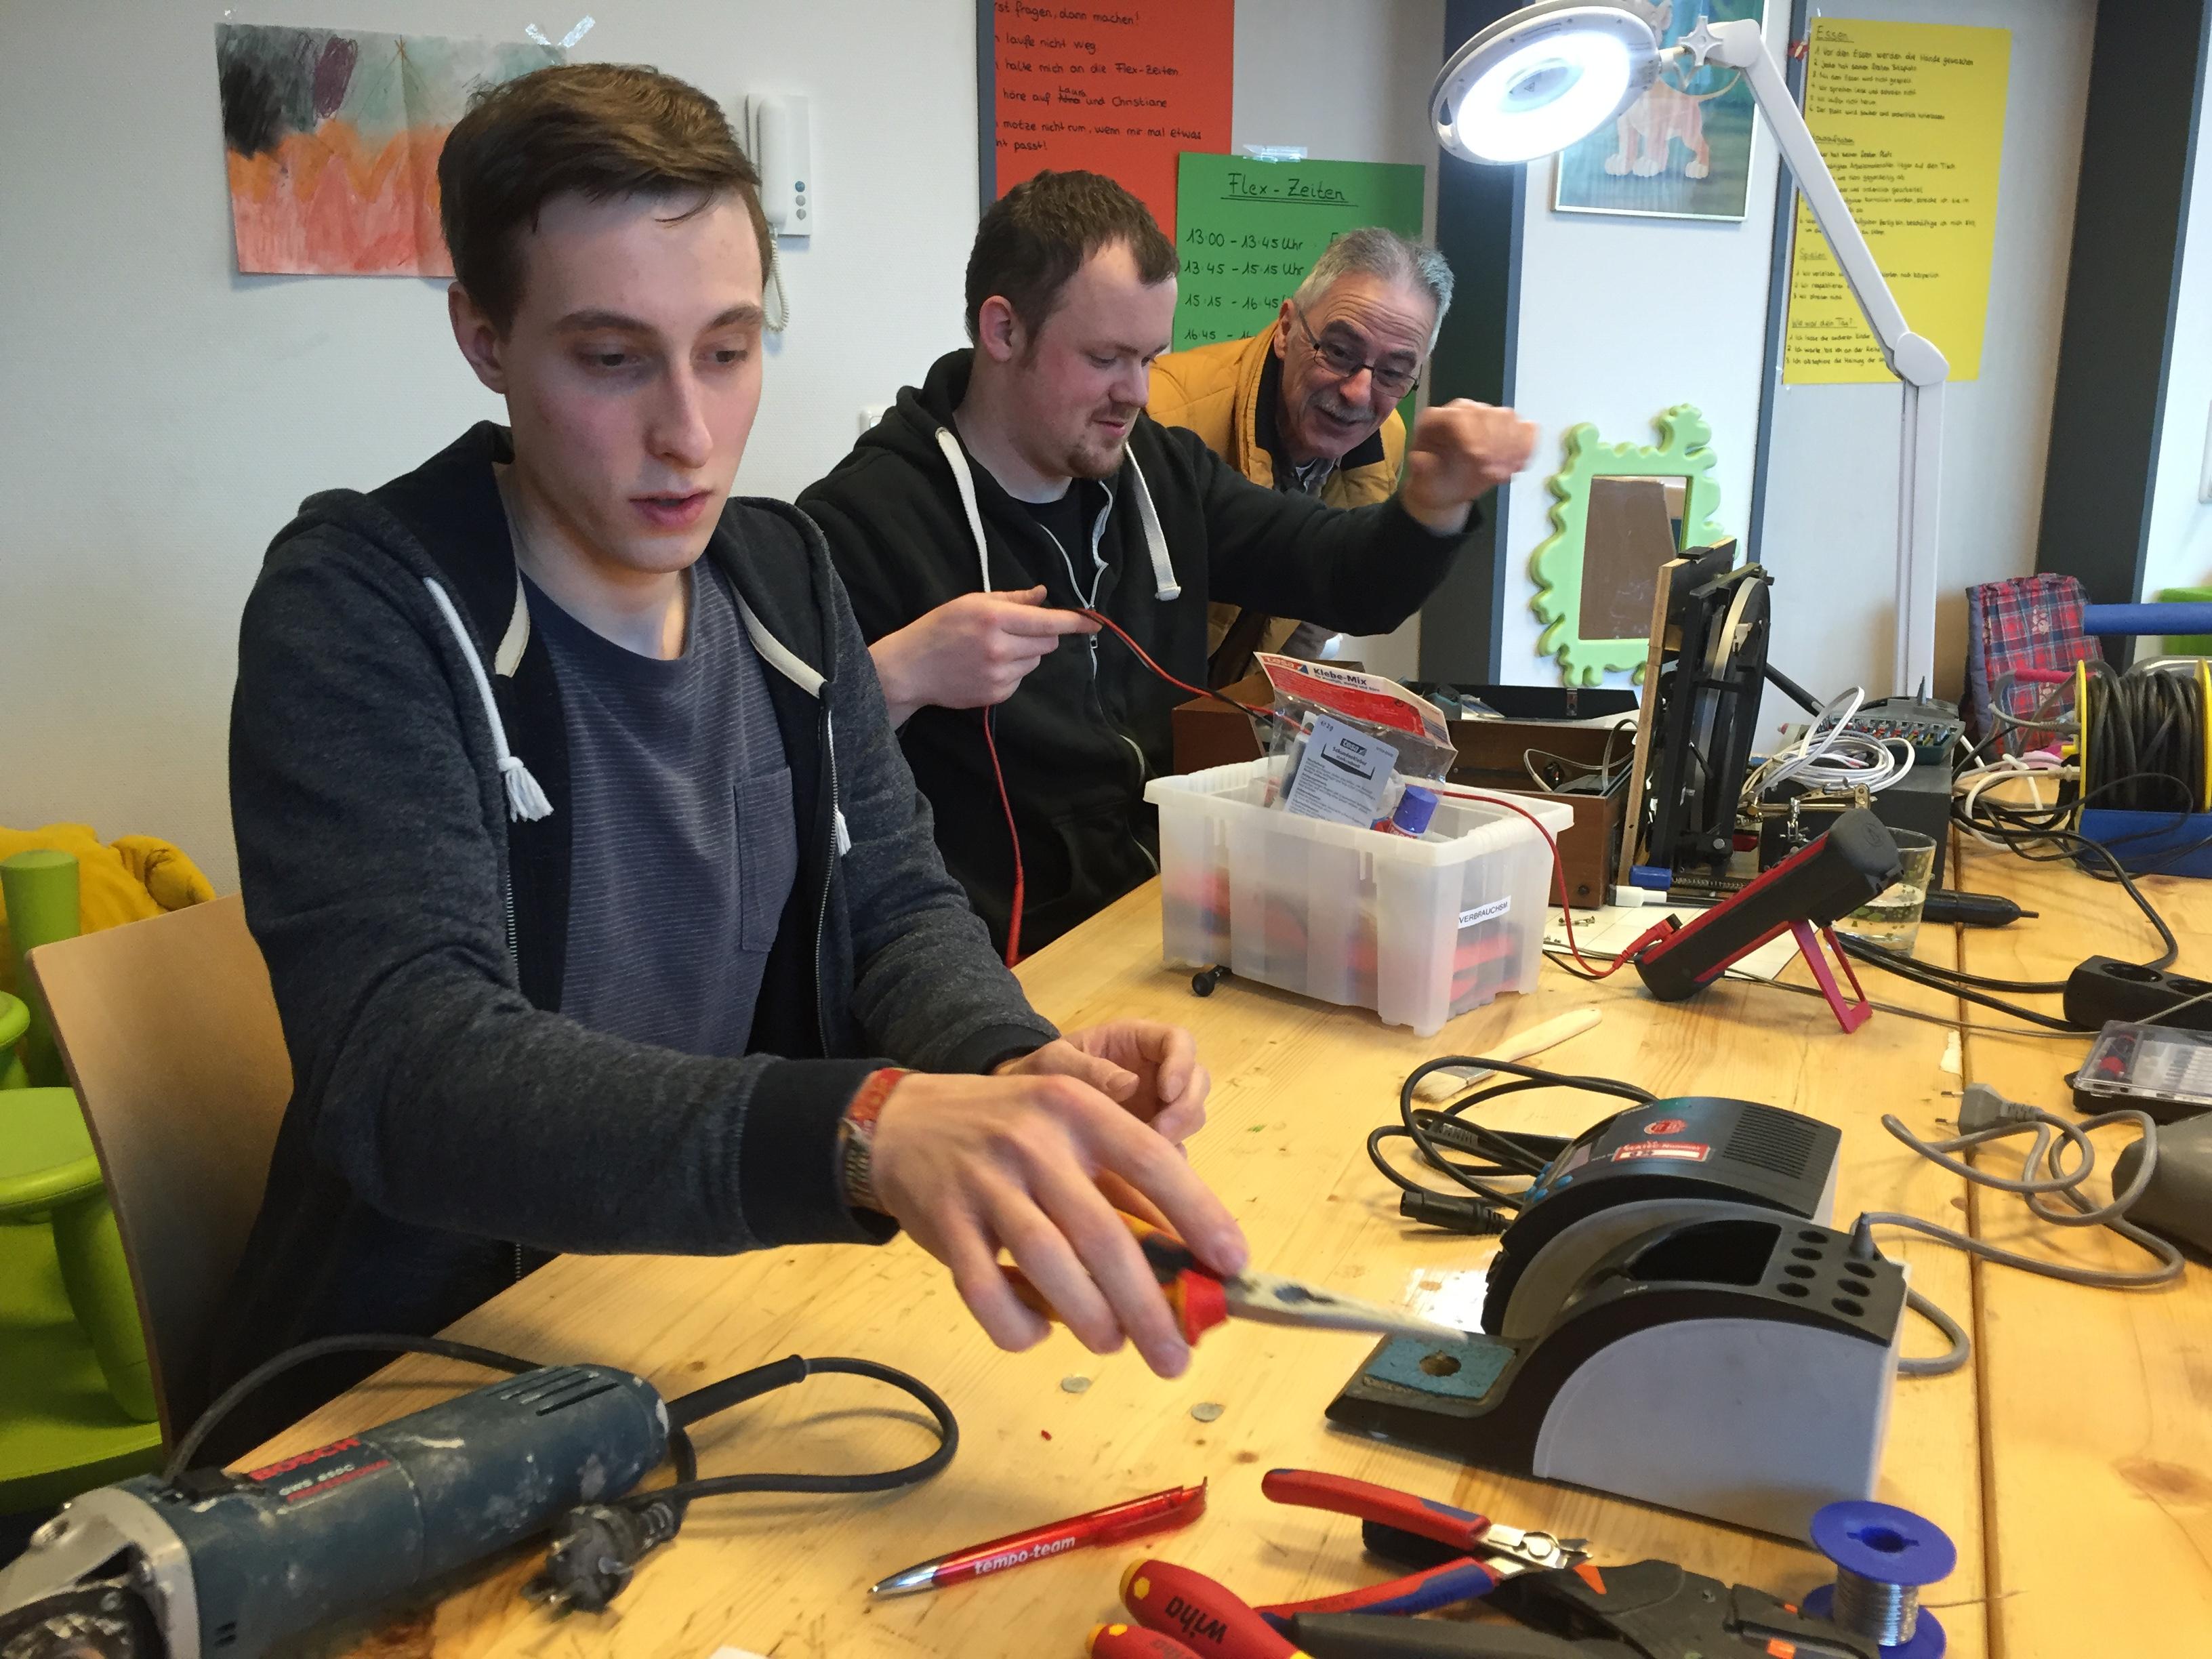 Repaircafé, 3 Männer reparieren altes